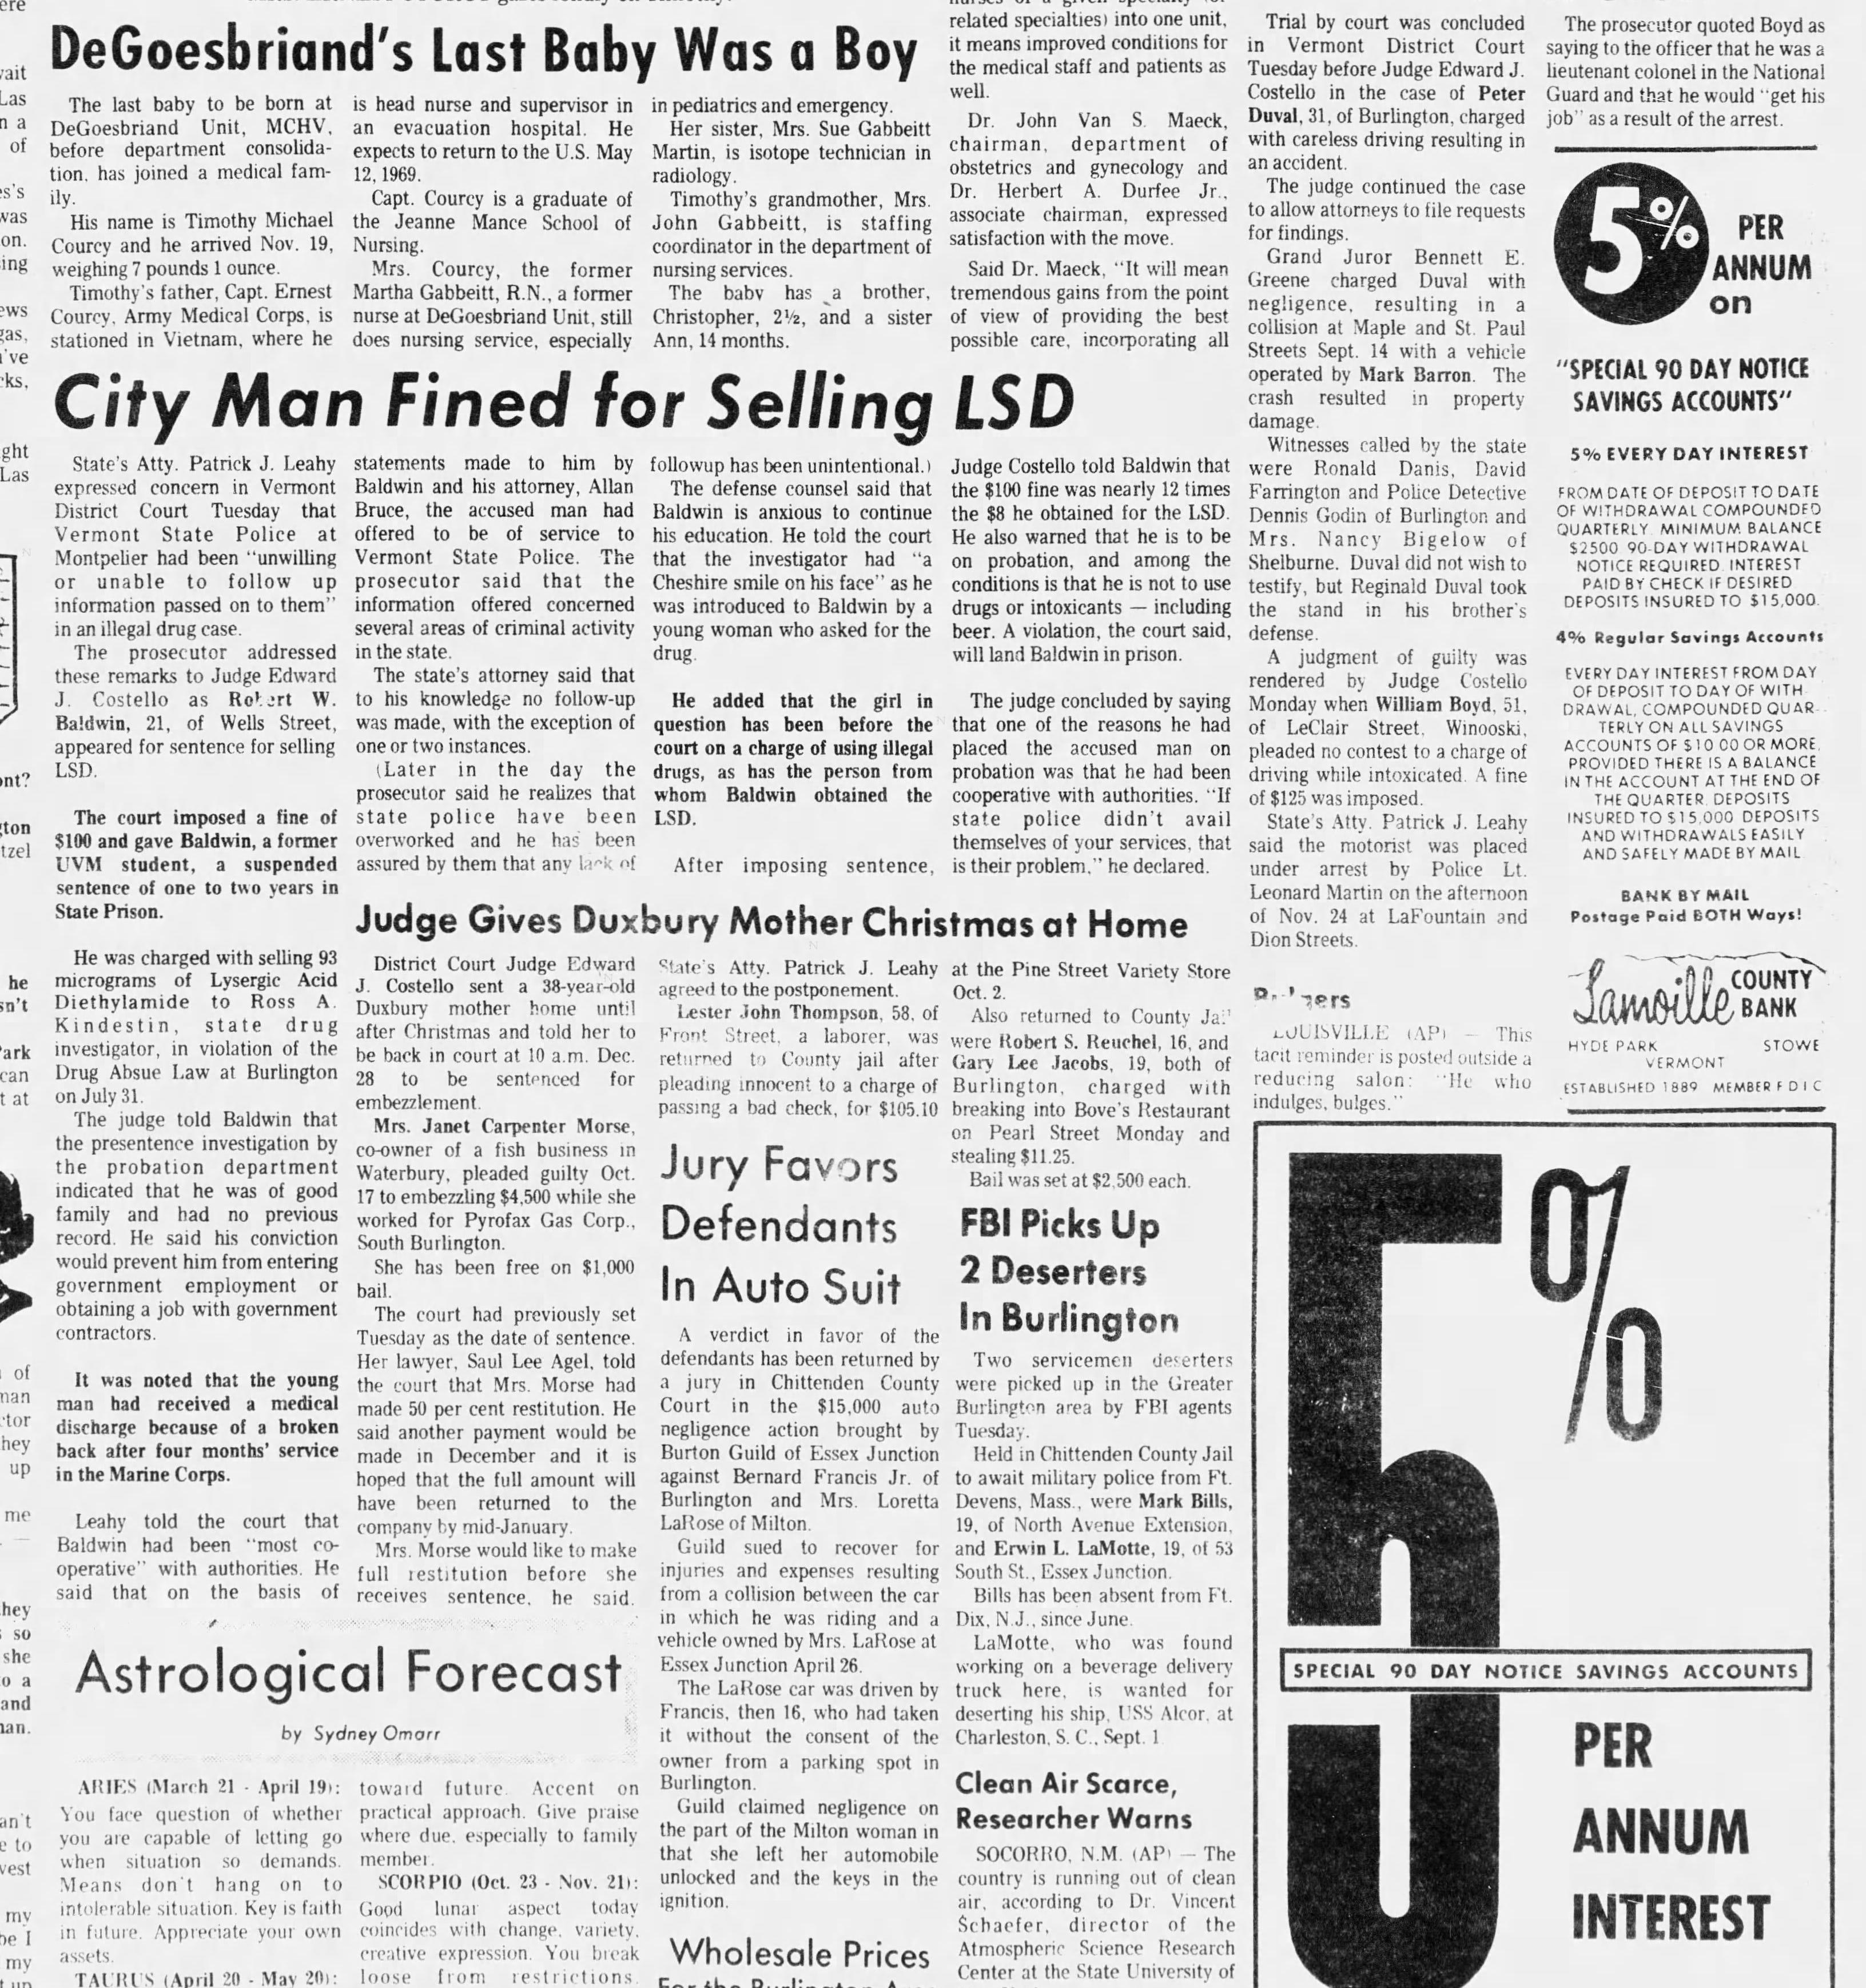 Burlington Free pRess Wed., Nov. 27, 1968.